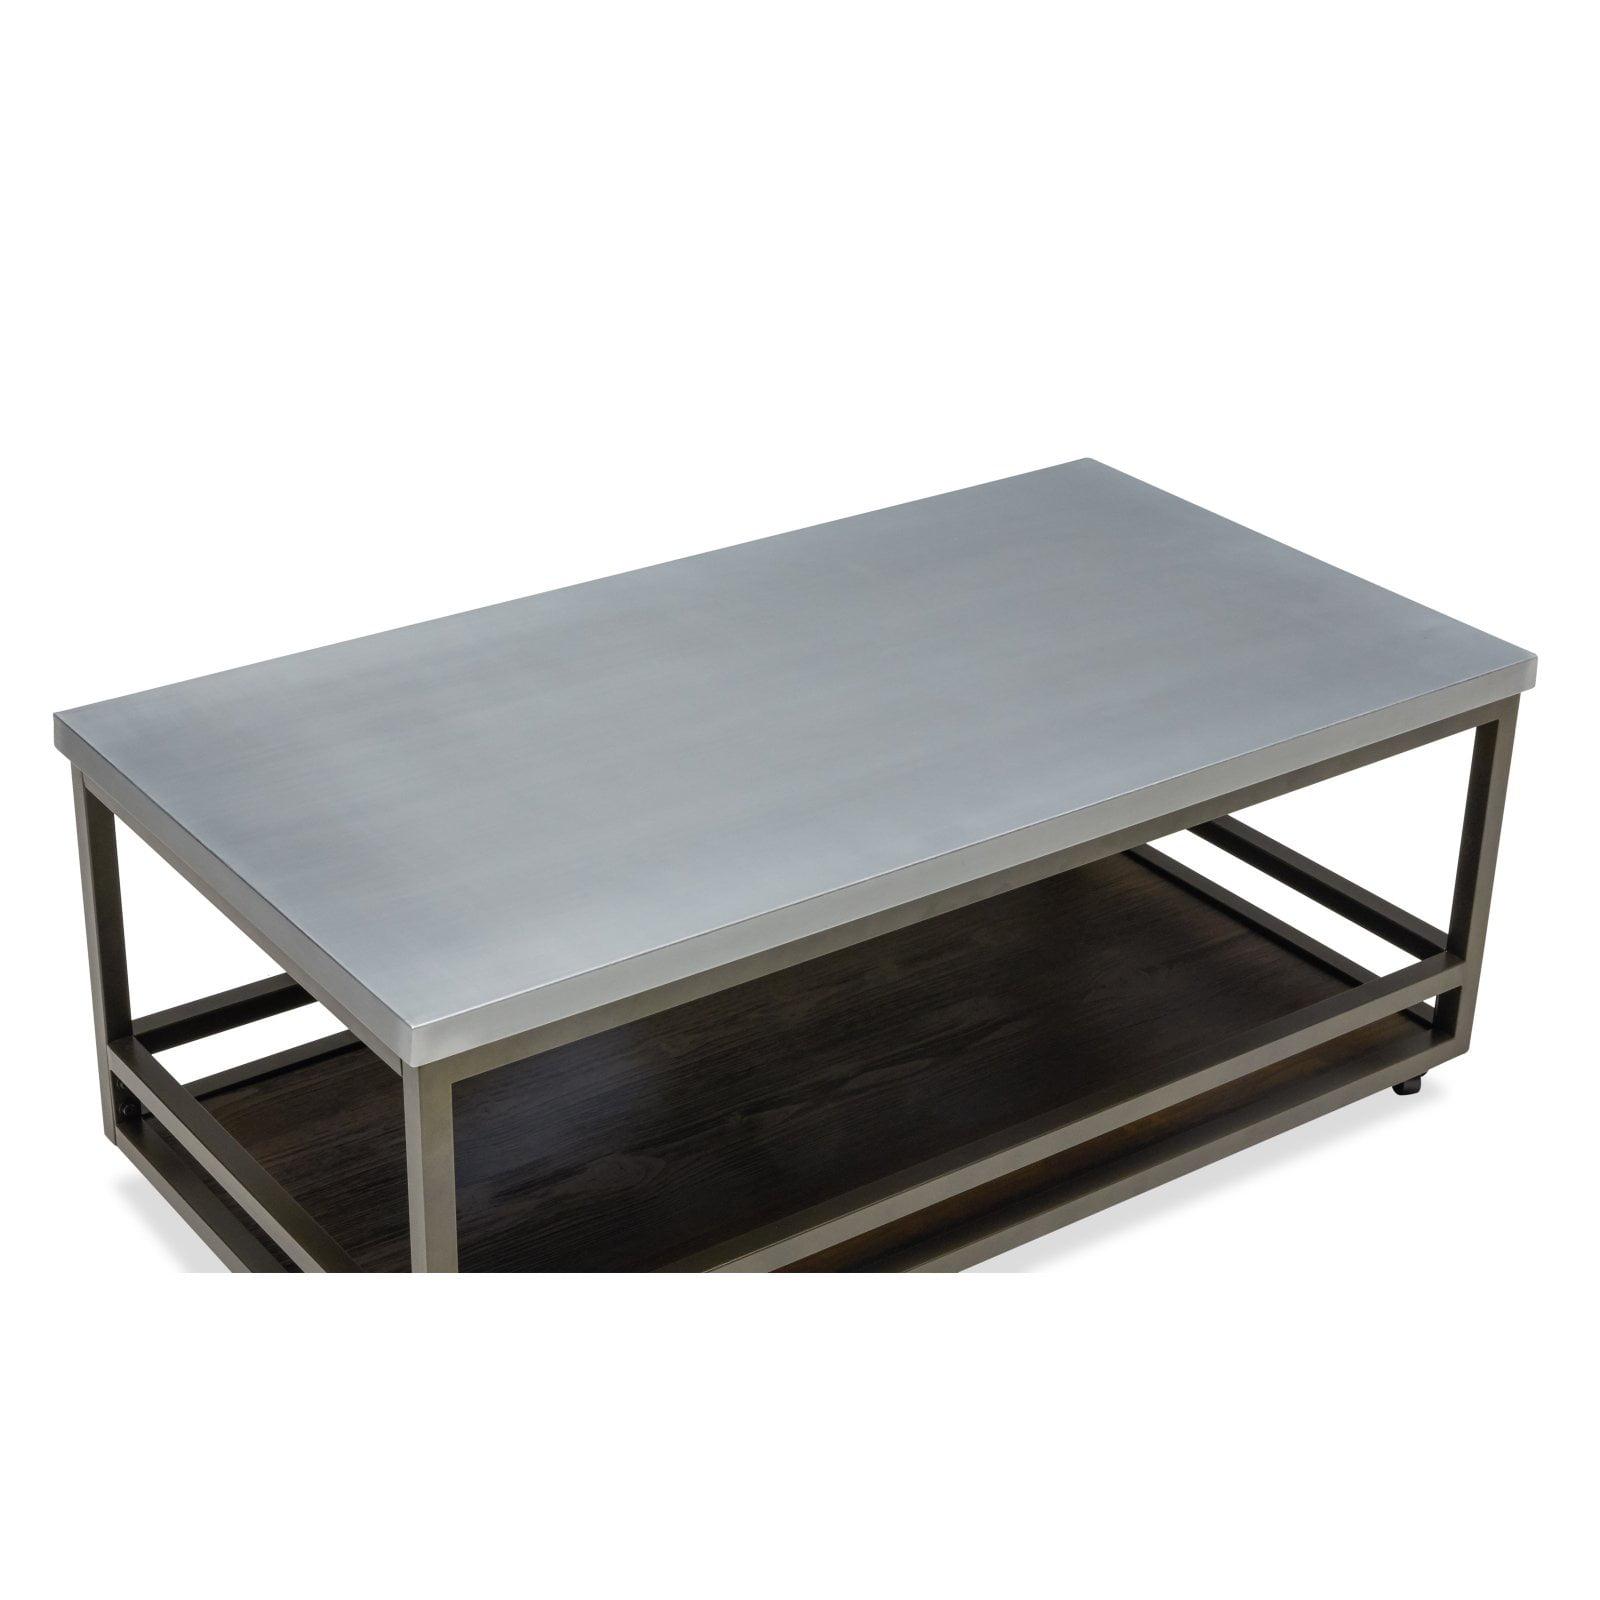 Stupendous Belham Living Ledger Coffee Table Walmart Com Pabps2019 Chair Design Images Pabps2019Com